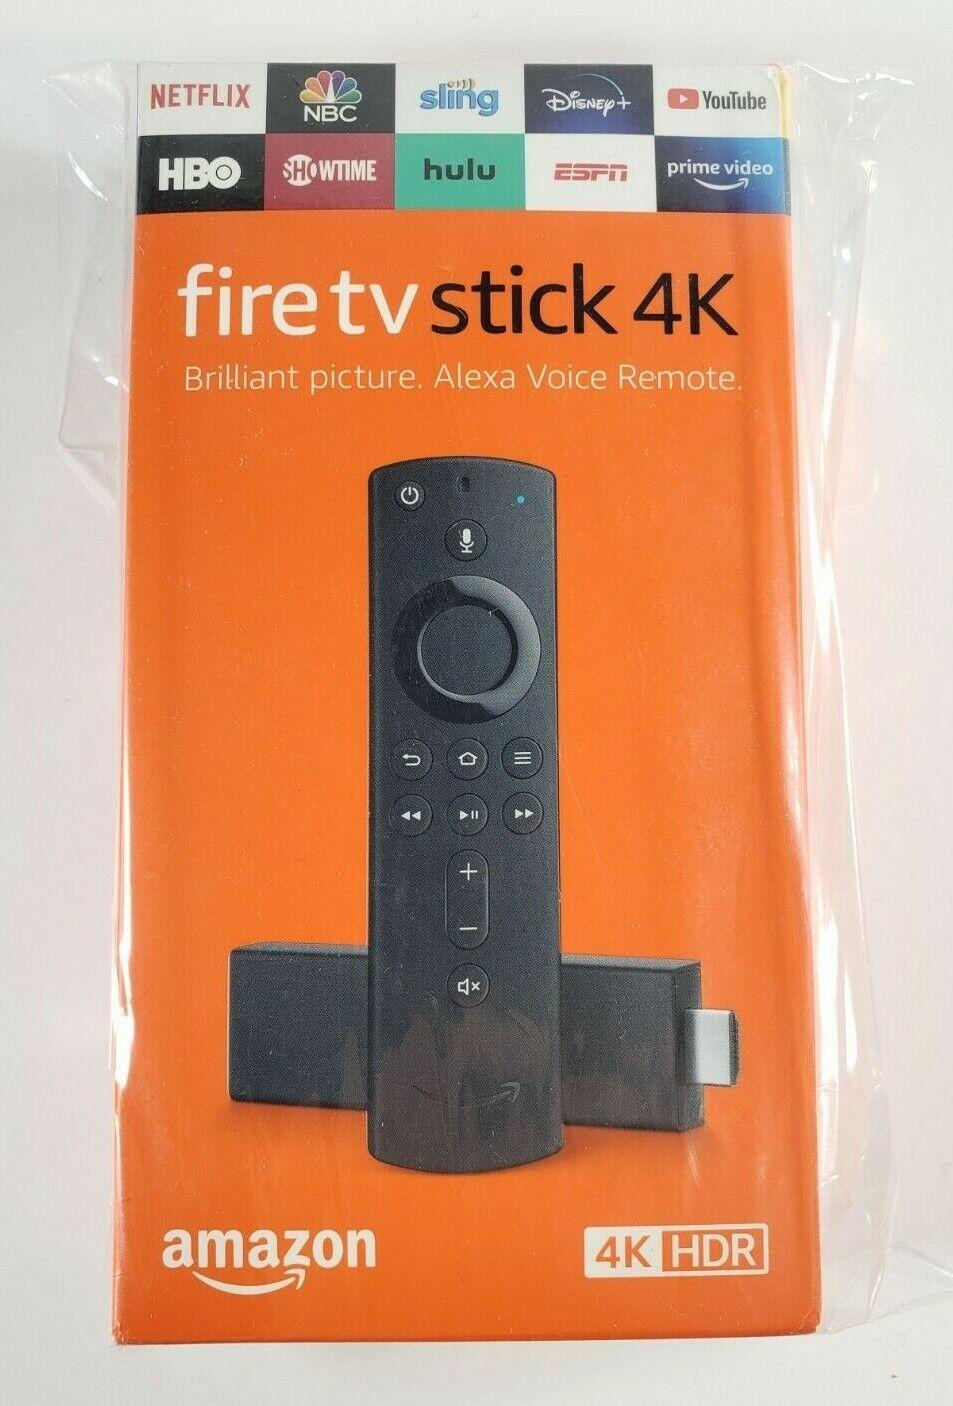 Amazon Fire TV Stick 4K, Streaming Media Player w/ Alexa, Latest Gen, Sealed! 🎁 amazon fire latest media player stick streaming